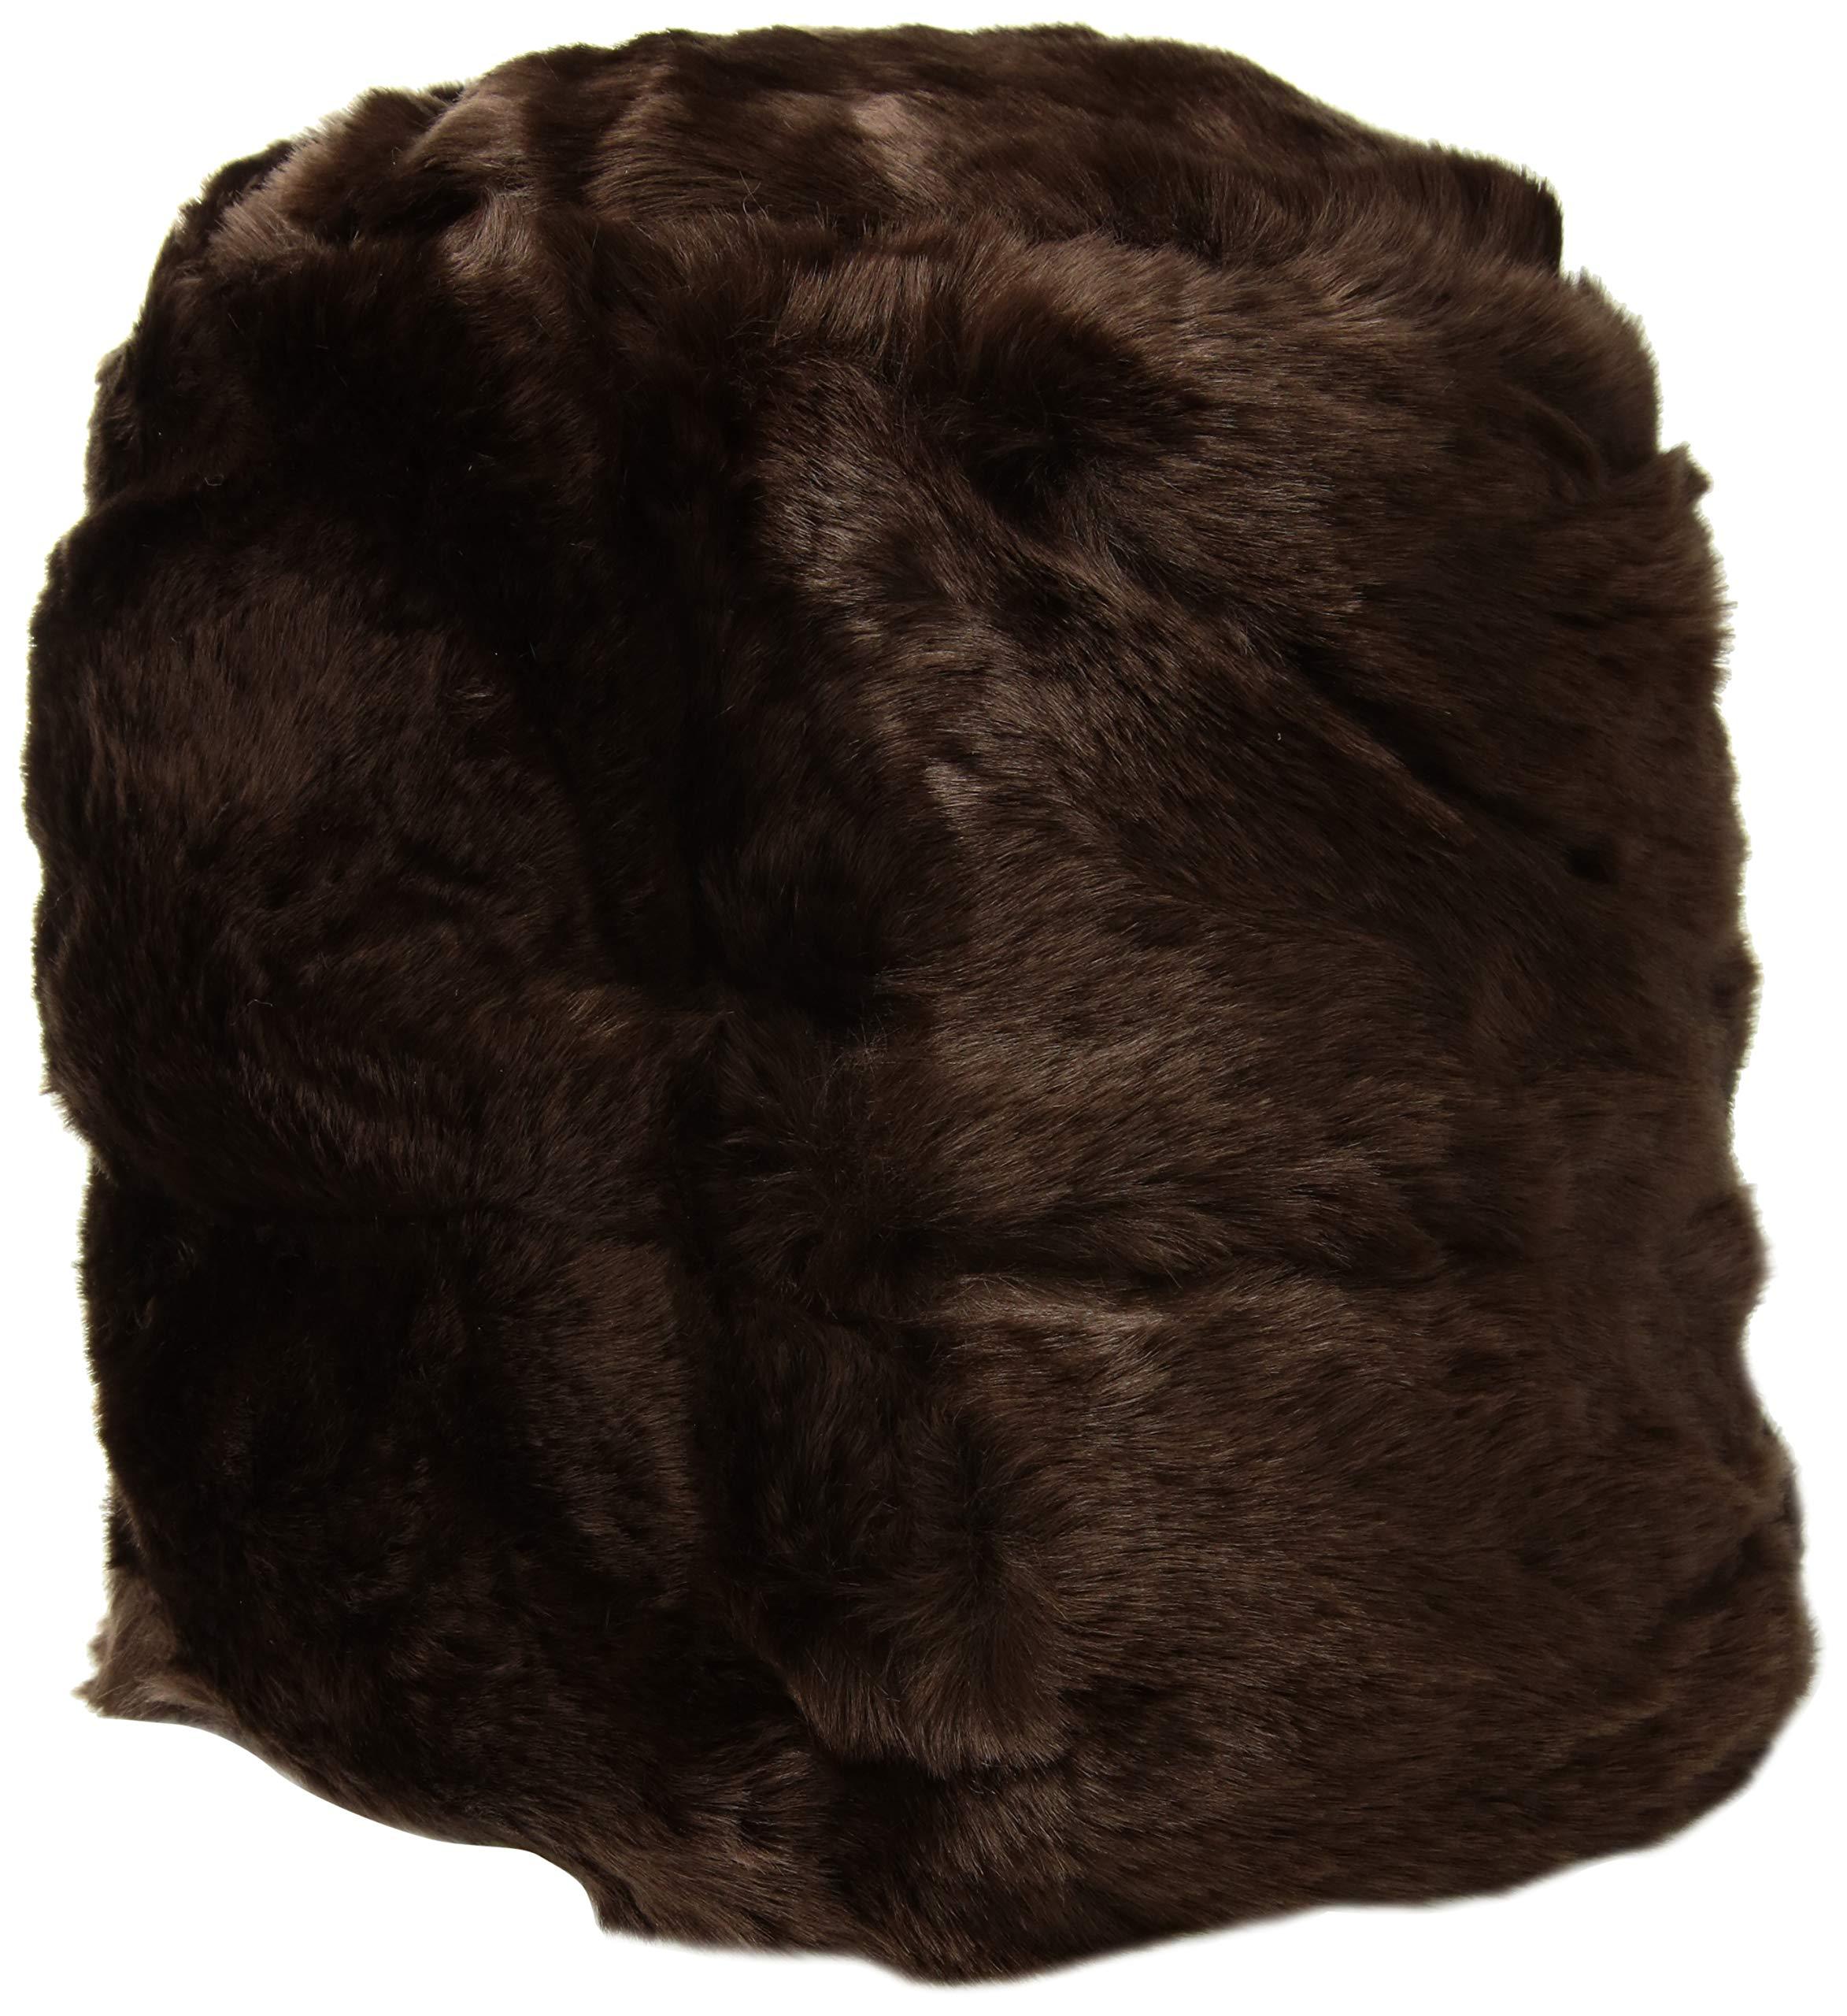 Nine West Women's Faux Fur Cuff Cloche, Brown one Size by Nine West (Image #1)